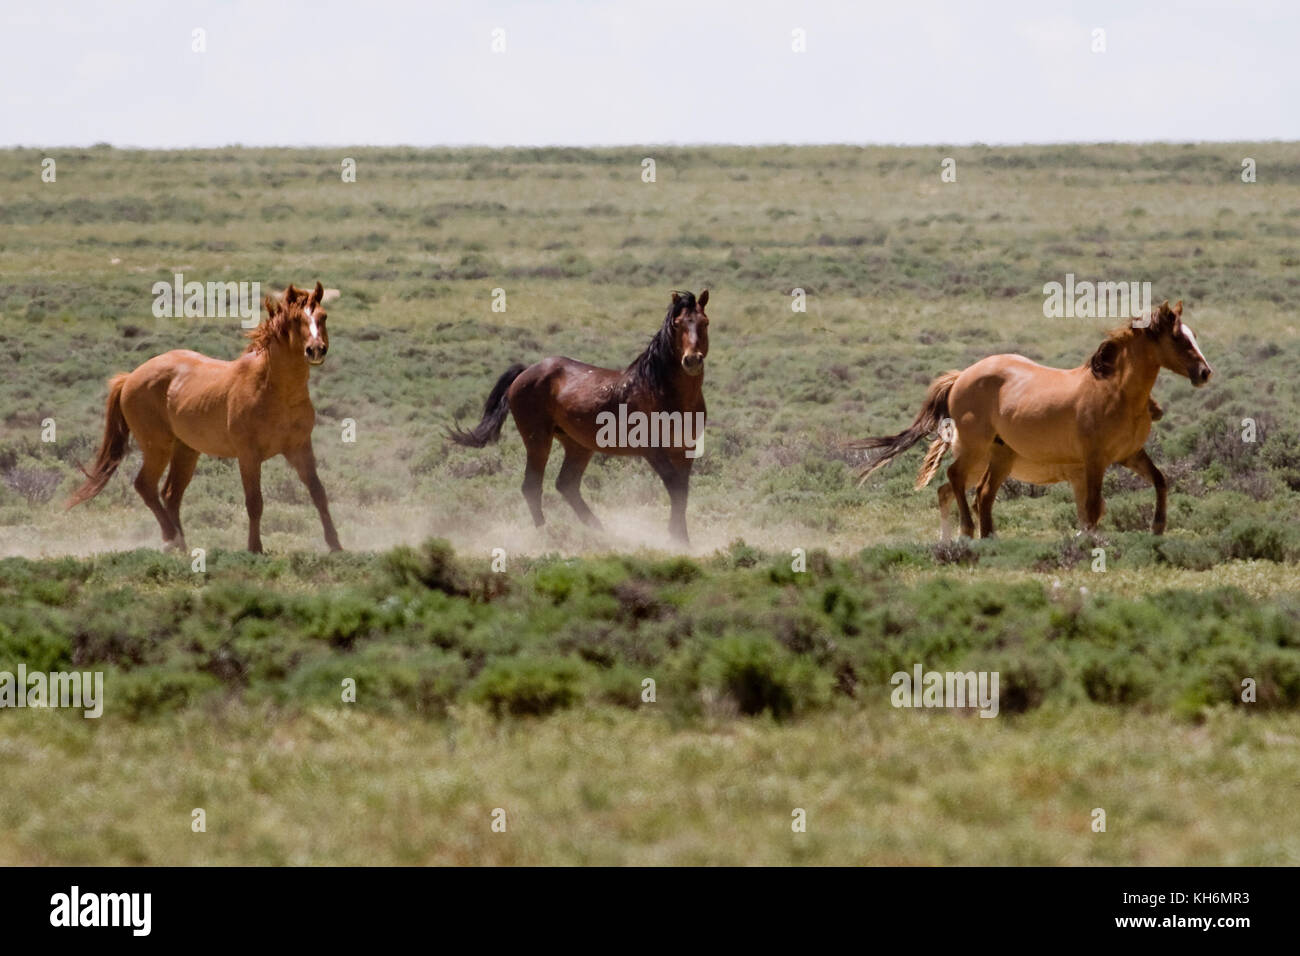 Wild horses on BLM land, Wyoming - Stock Image